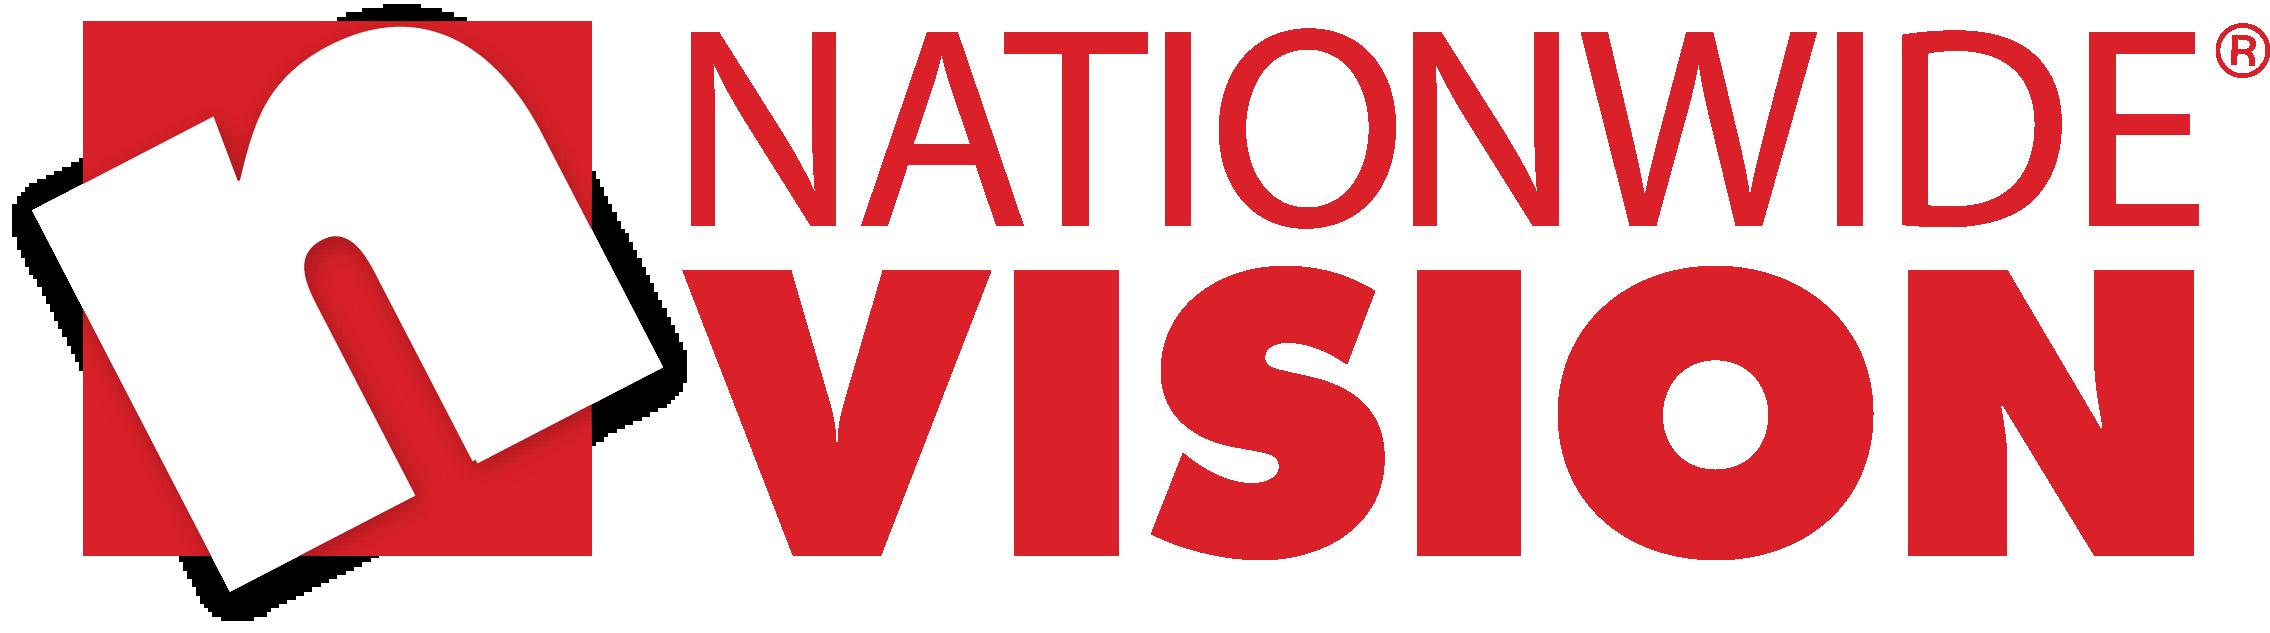 Nationwide Vision Logo